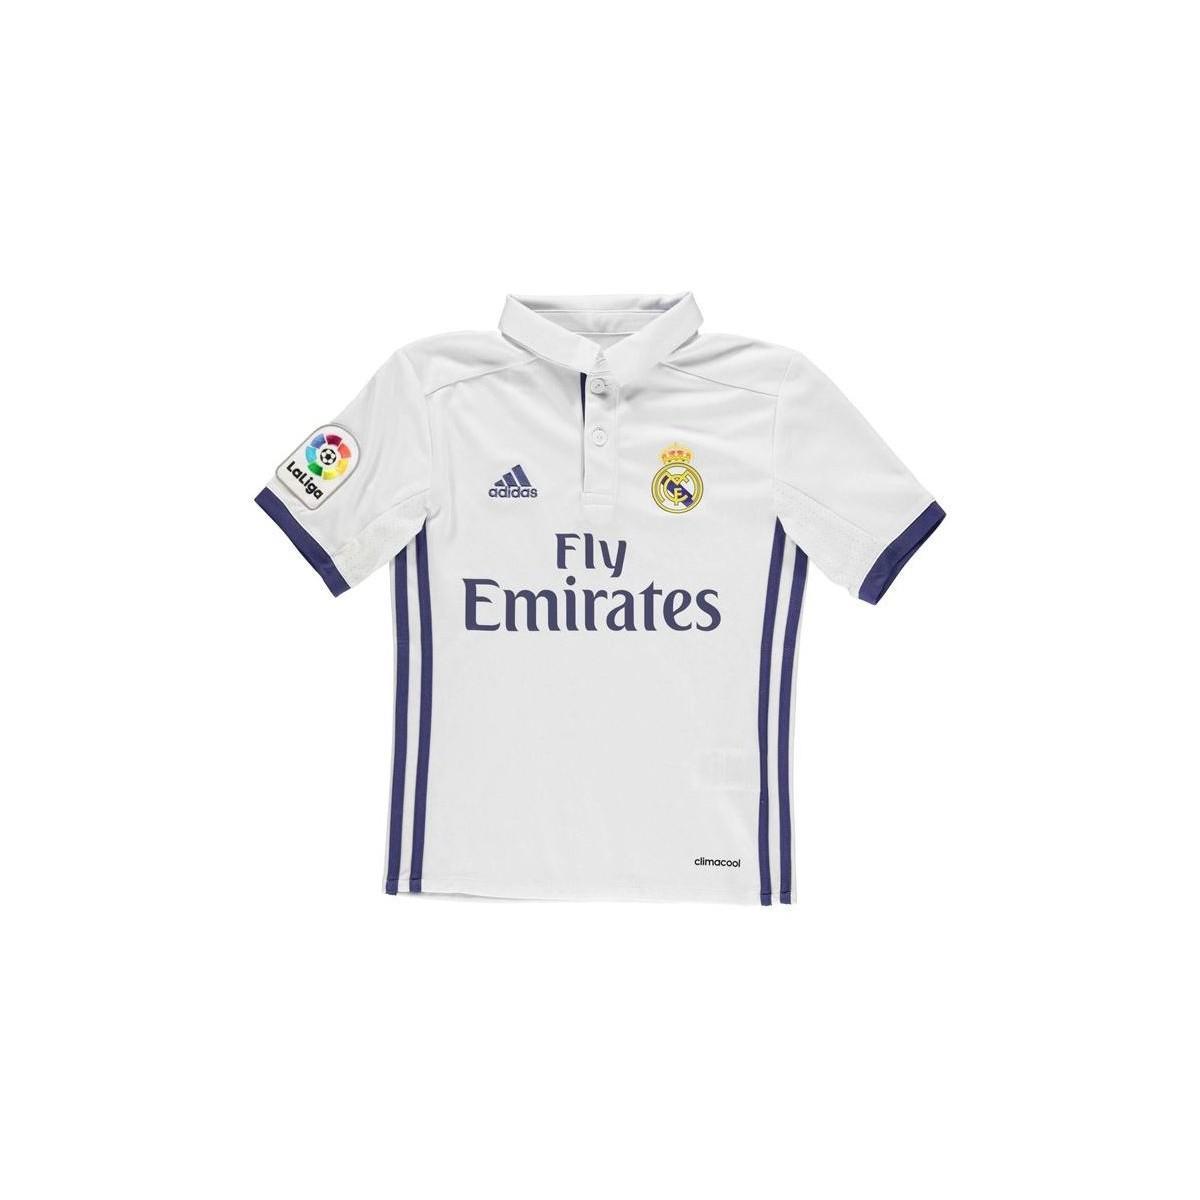 e07e46708 Adidas - 2016-17 Real Madrid Home Shirt (kroos 8) - Kids Men s. View  fullscreen